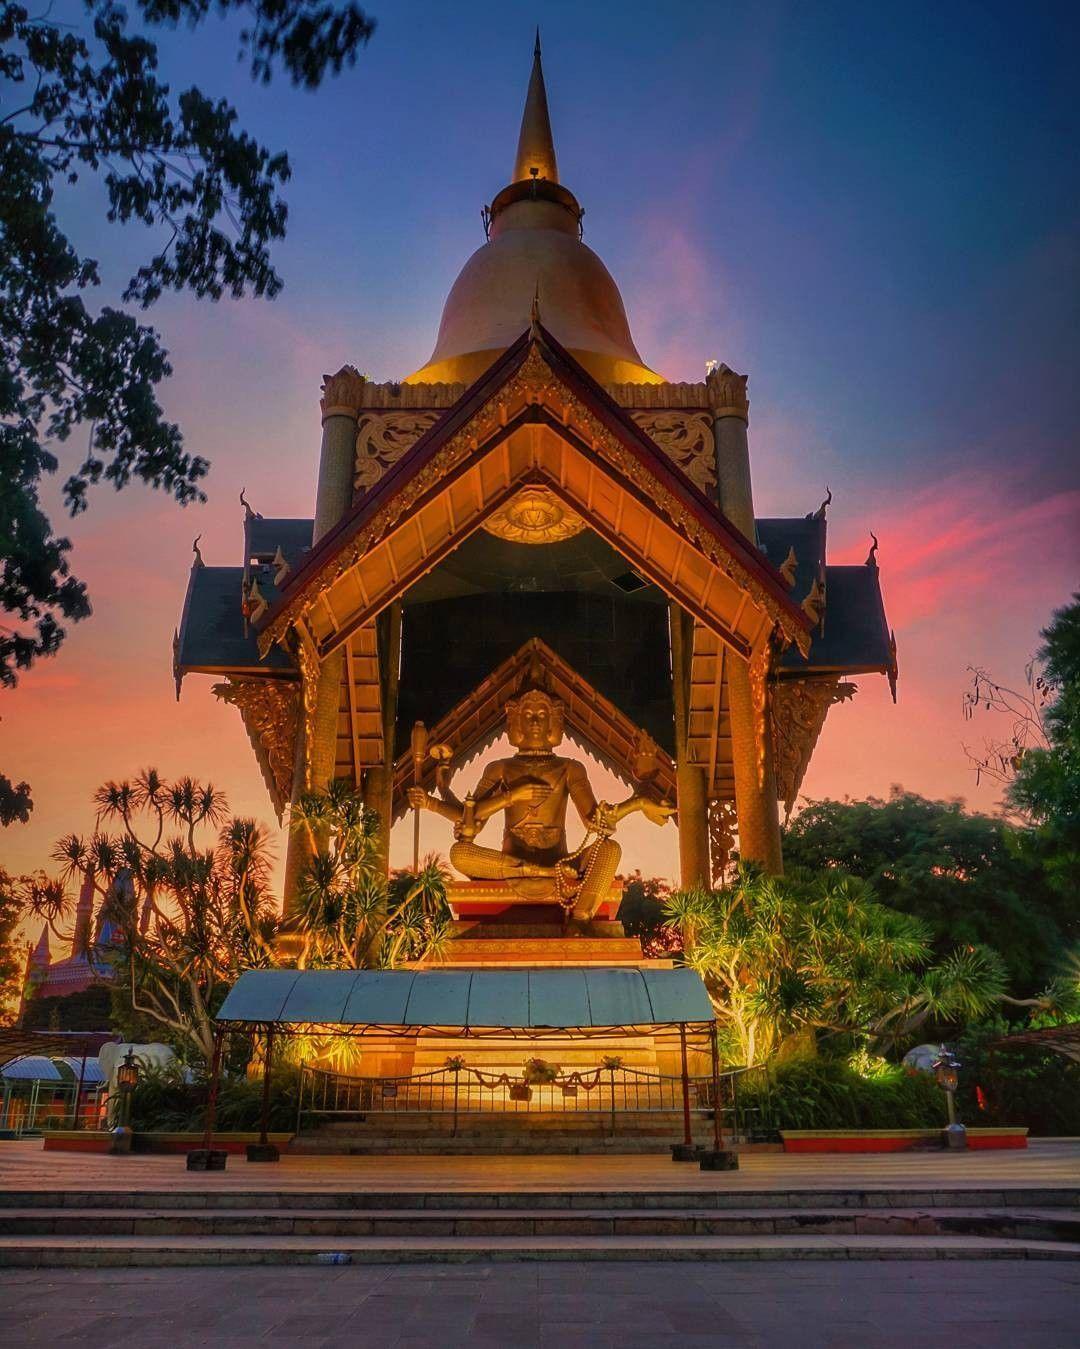 Indahnya 7 Tempat Wisata Religi Surabaya Kota Multietnis Patung Budha